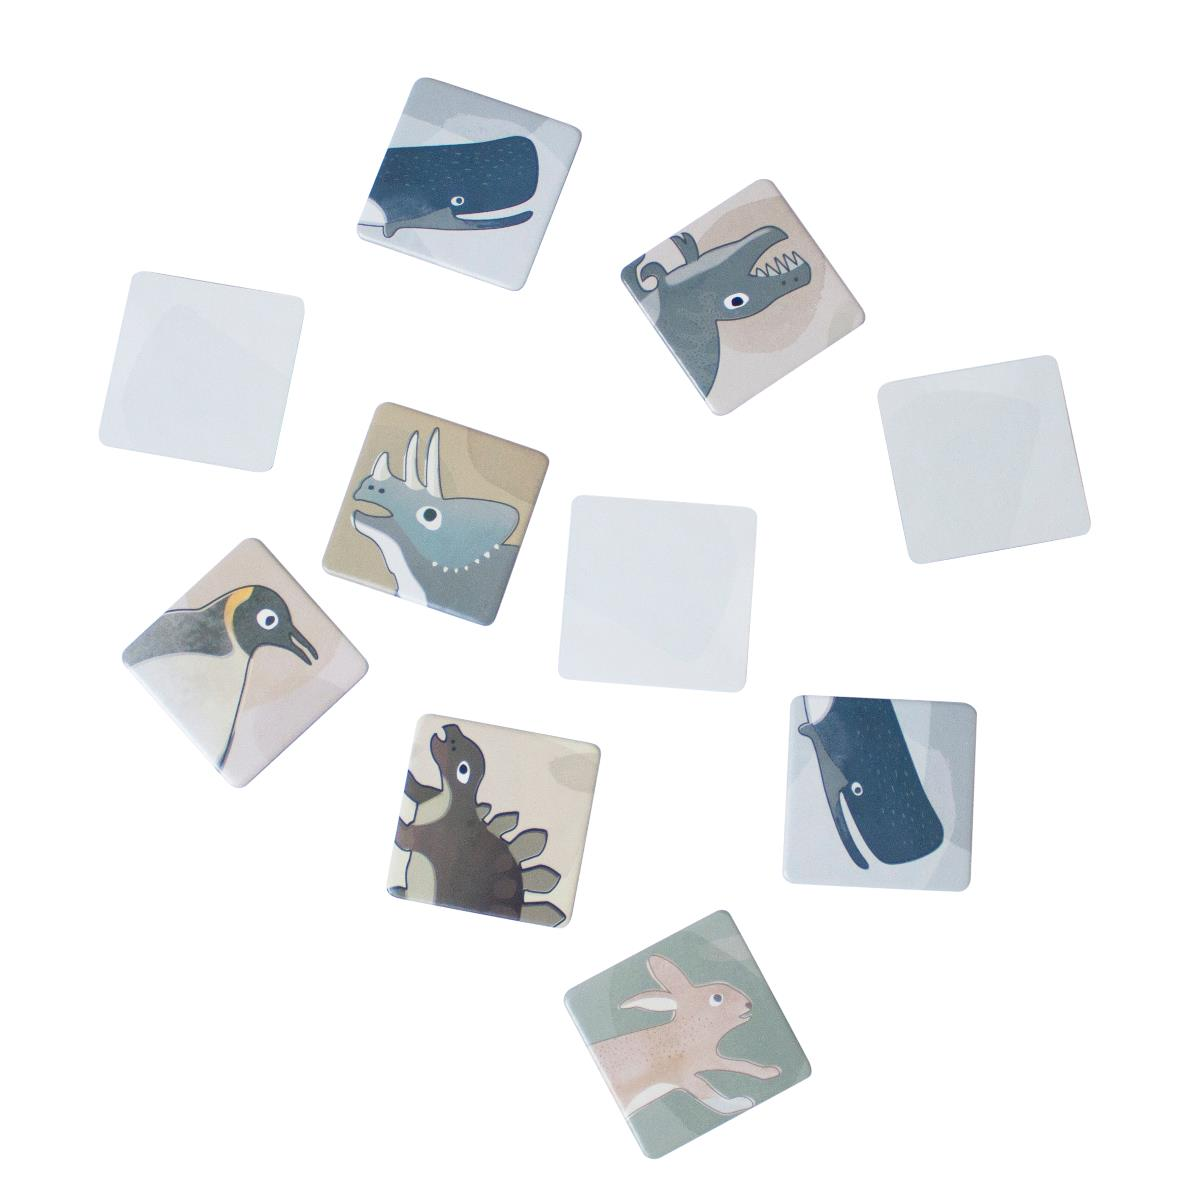 sebra Memory in der Box, Dino:Arctic animals 3015307 - 01